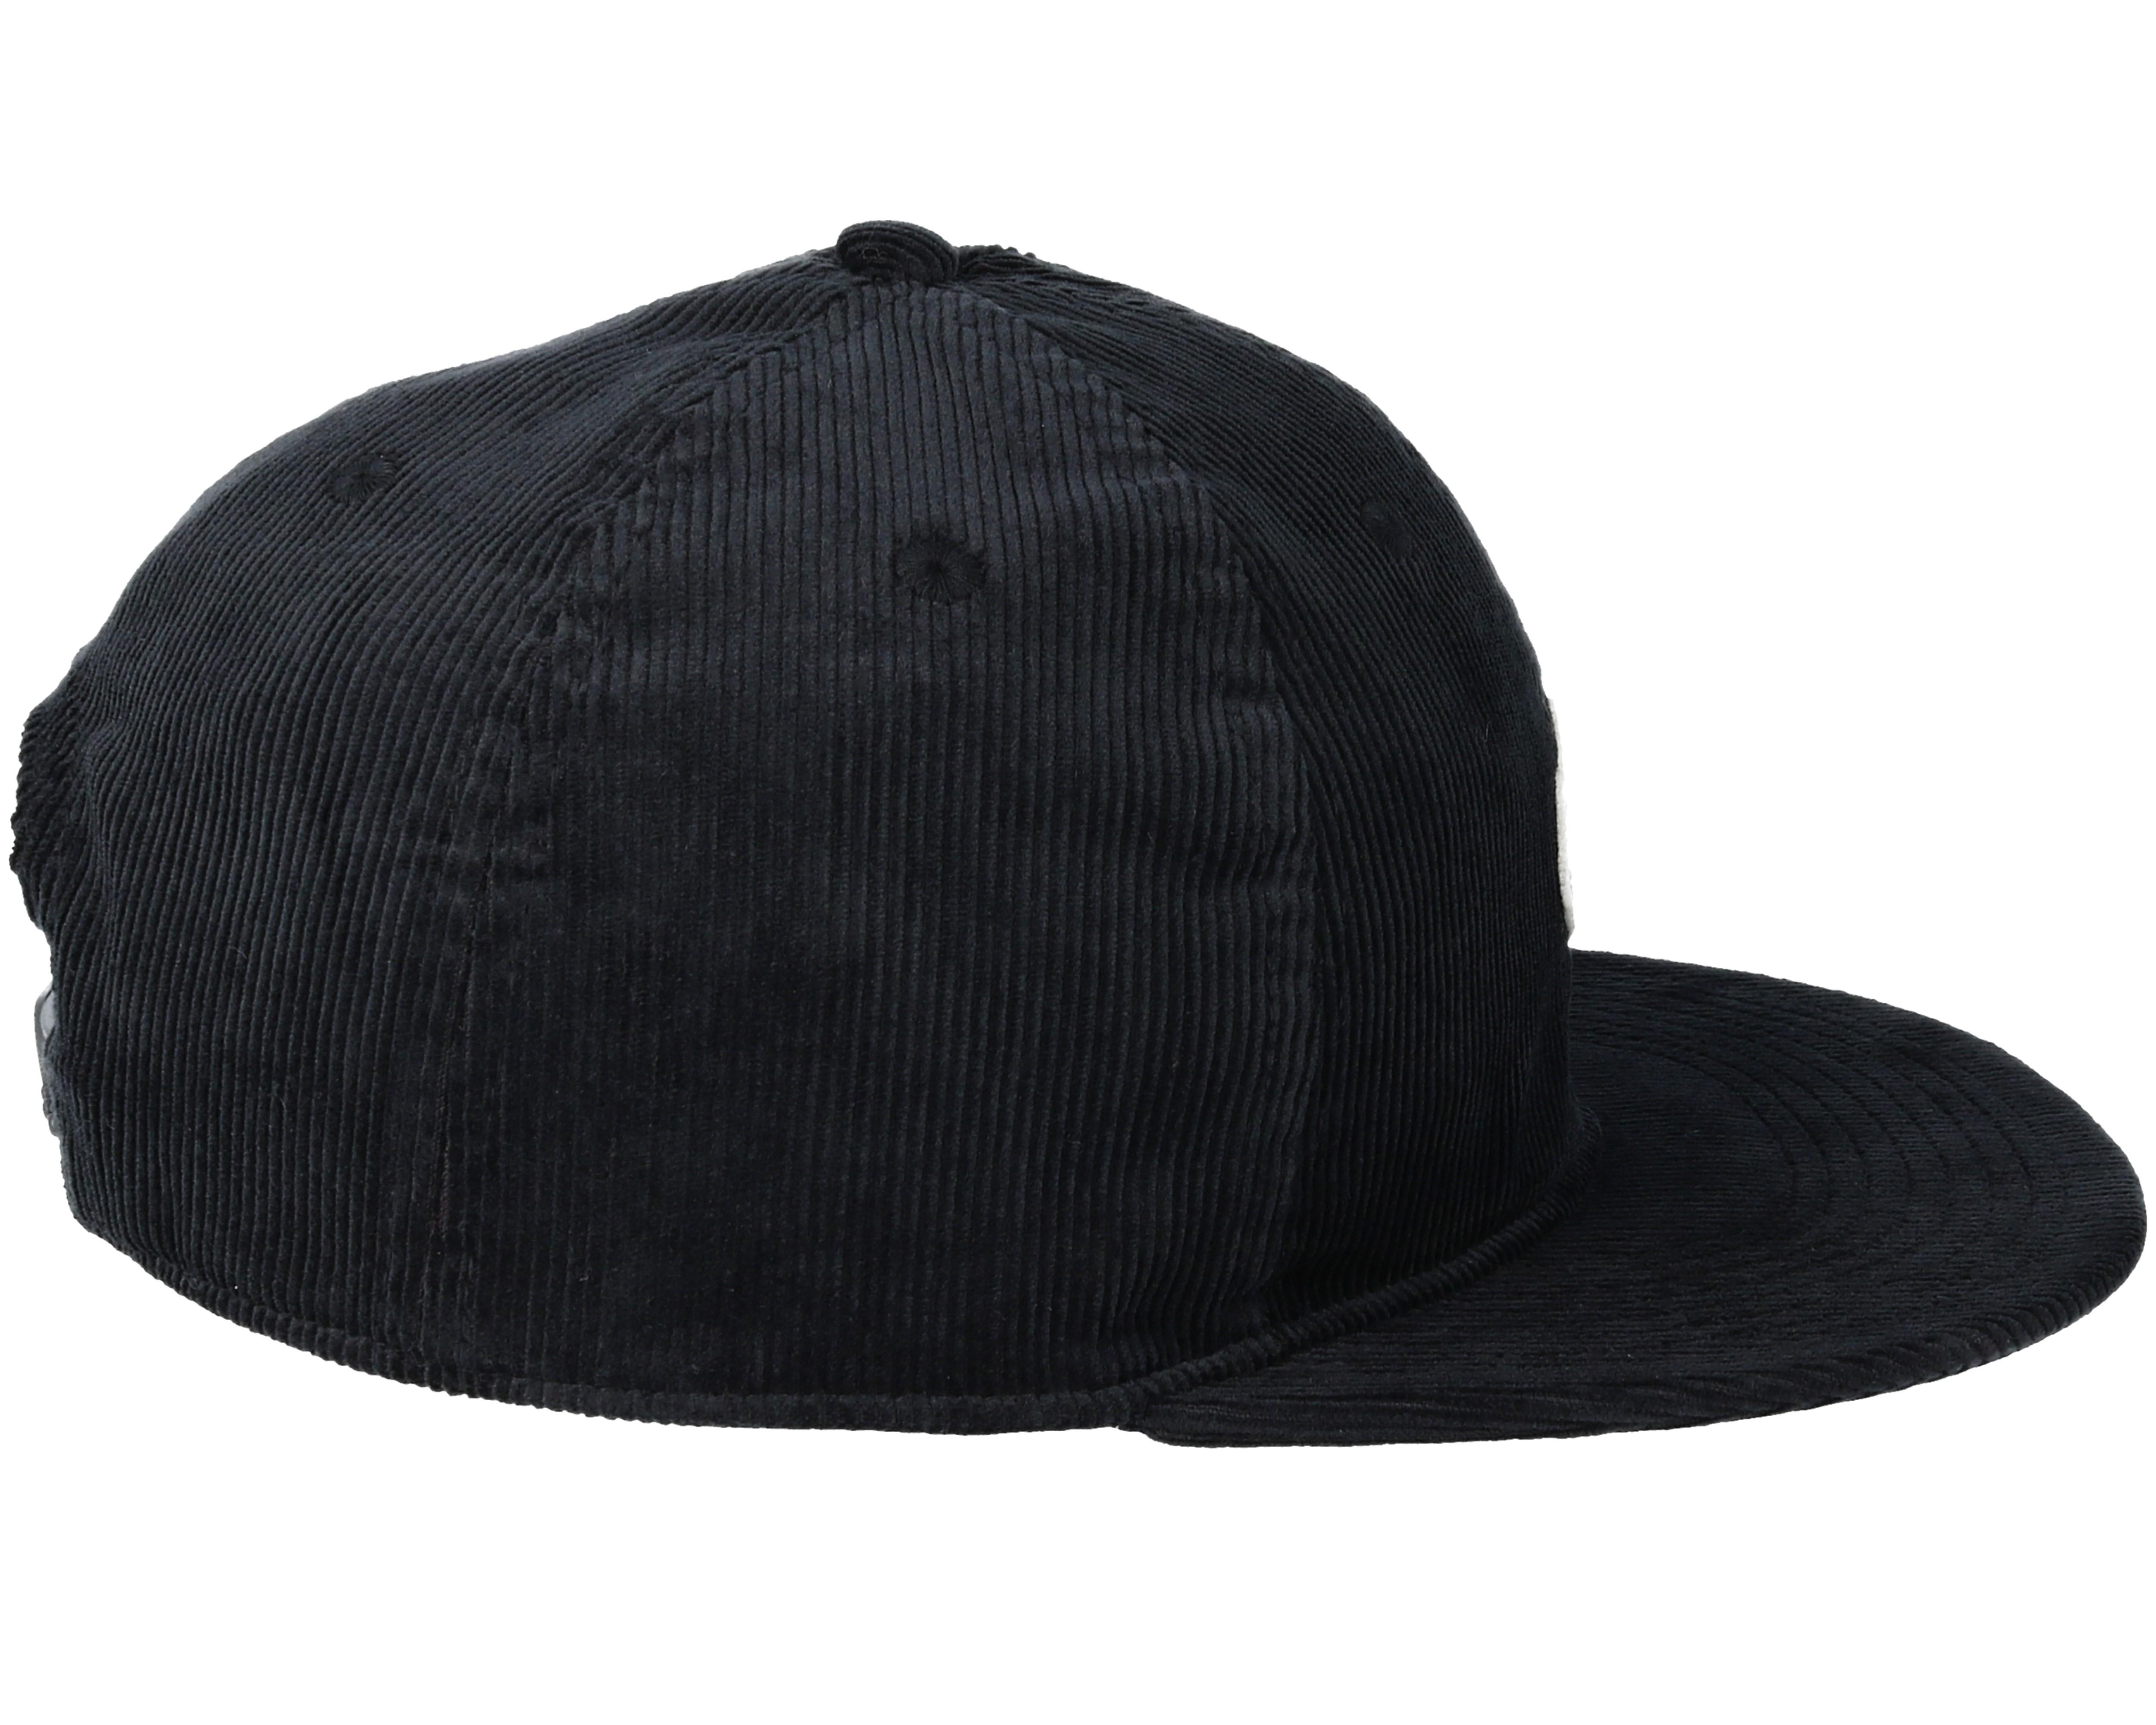 Oakley Det Cord >> Strike A Cord Black Snapback - The North Face caps - Hatstore.no